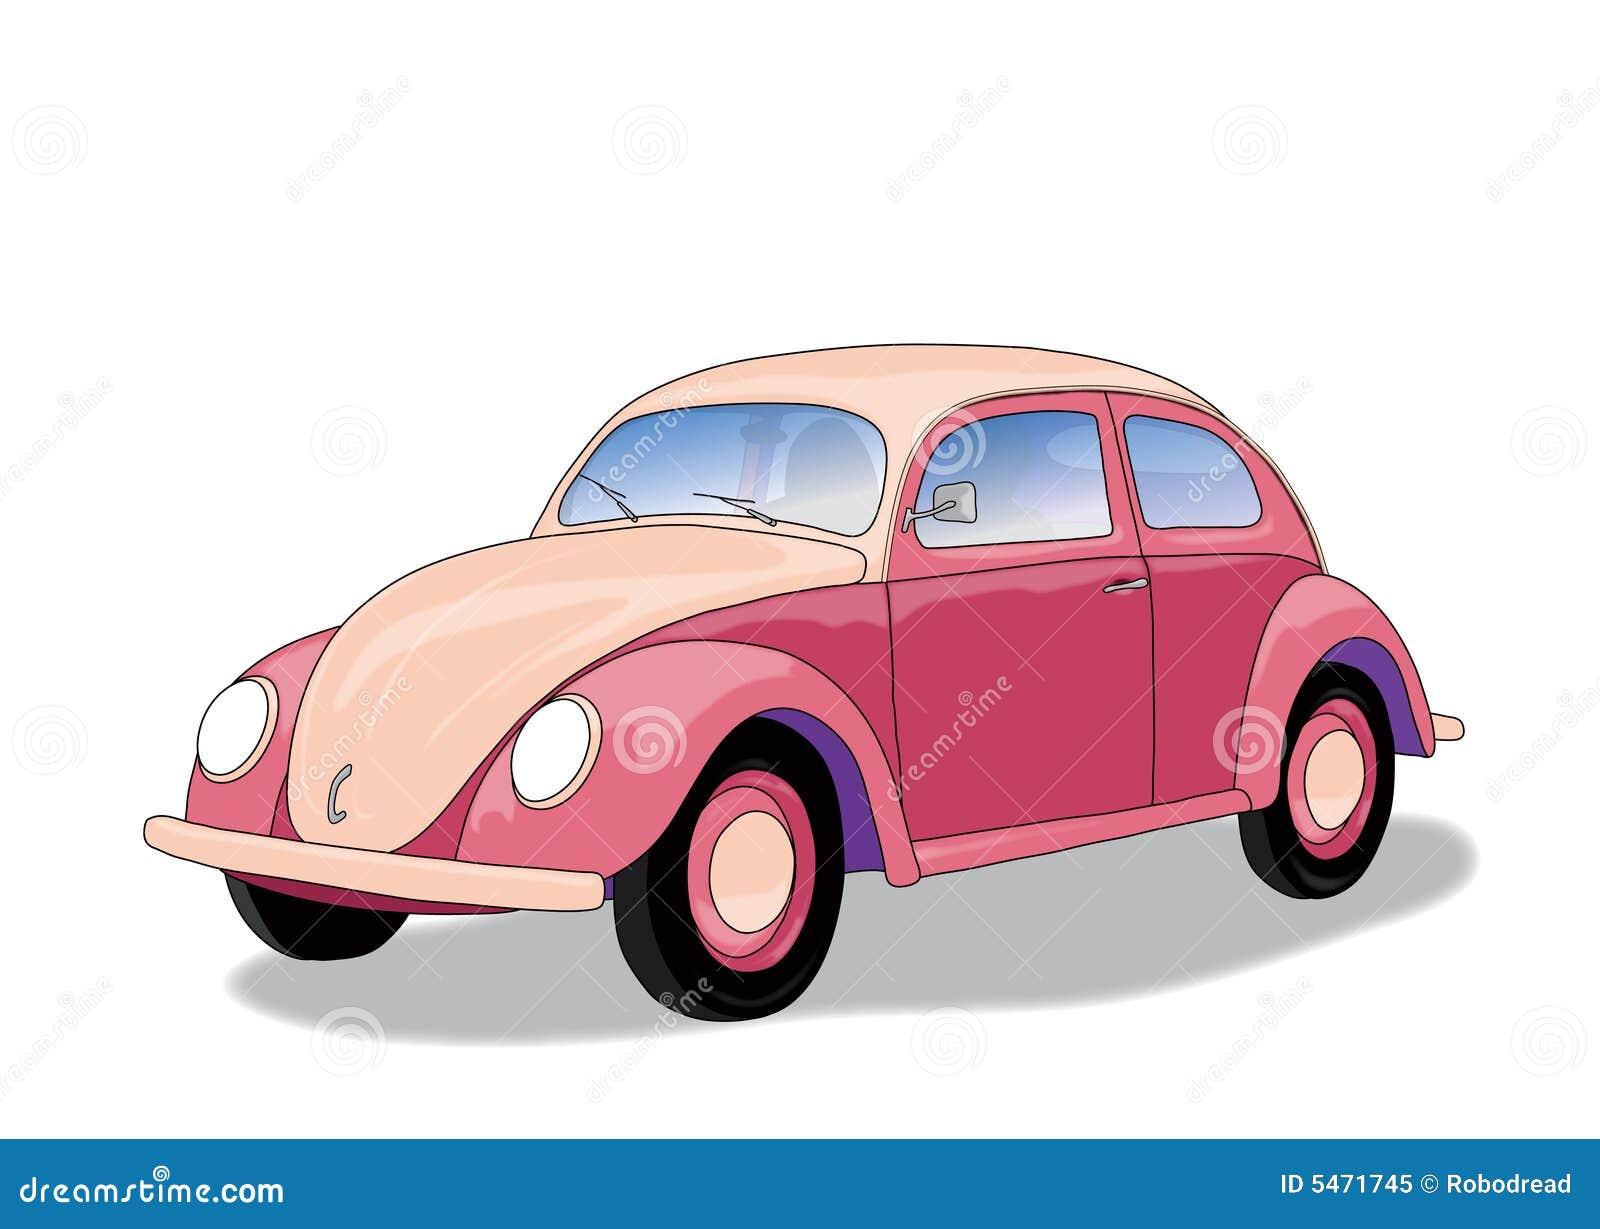 Volkswagen Beetle Pink >> Pink Car (vector) Royalty Free Stock Photo - Image: 5471745